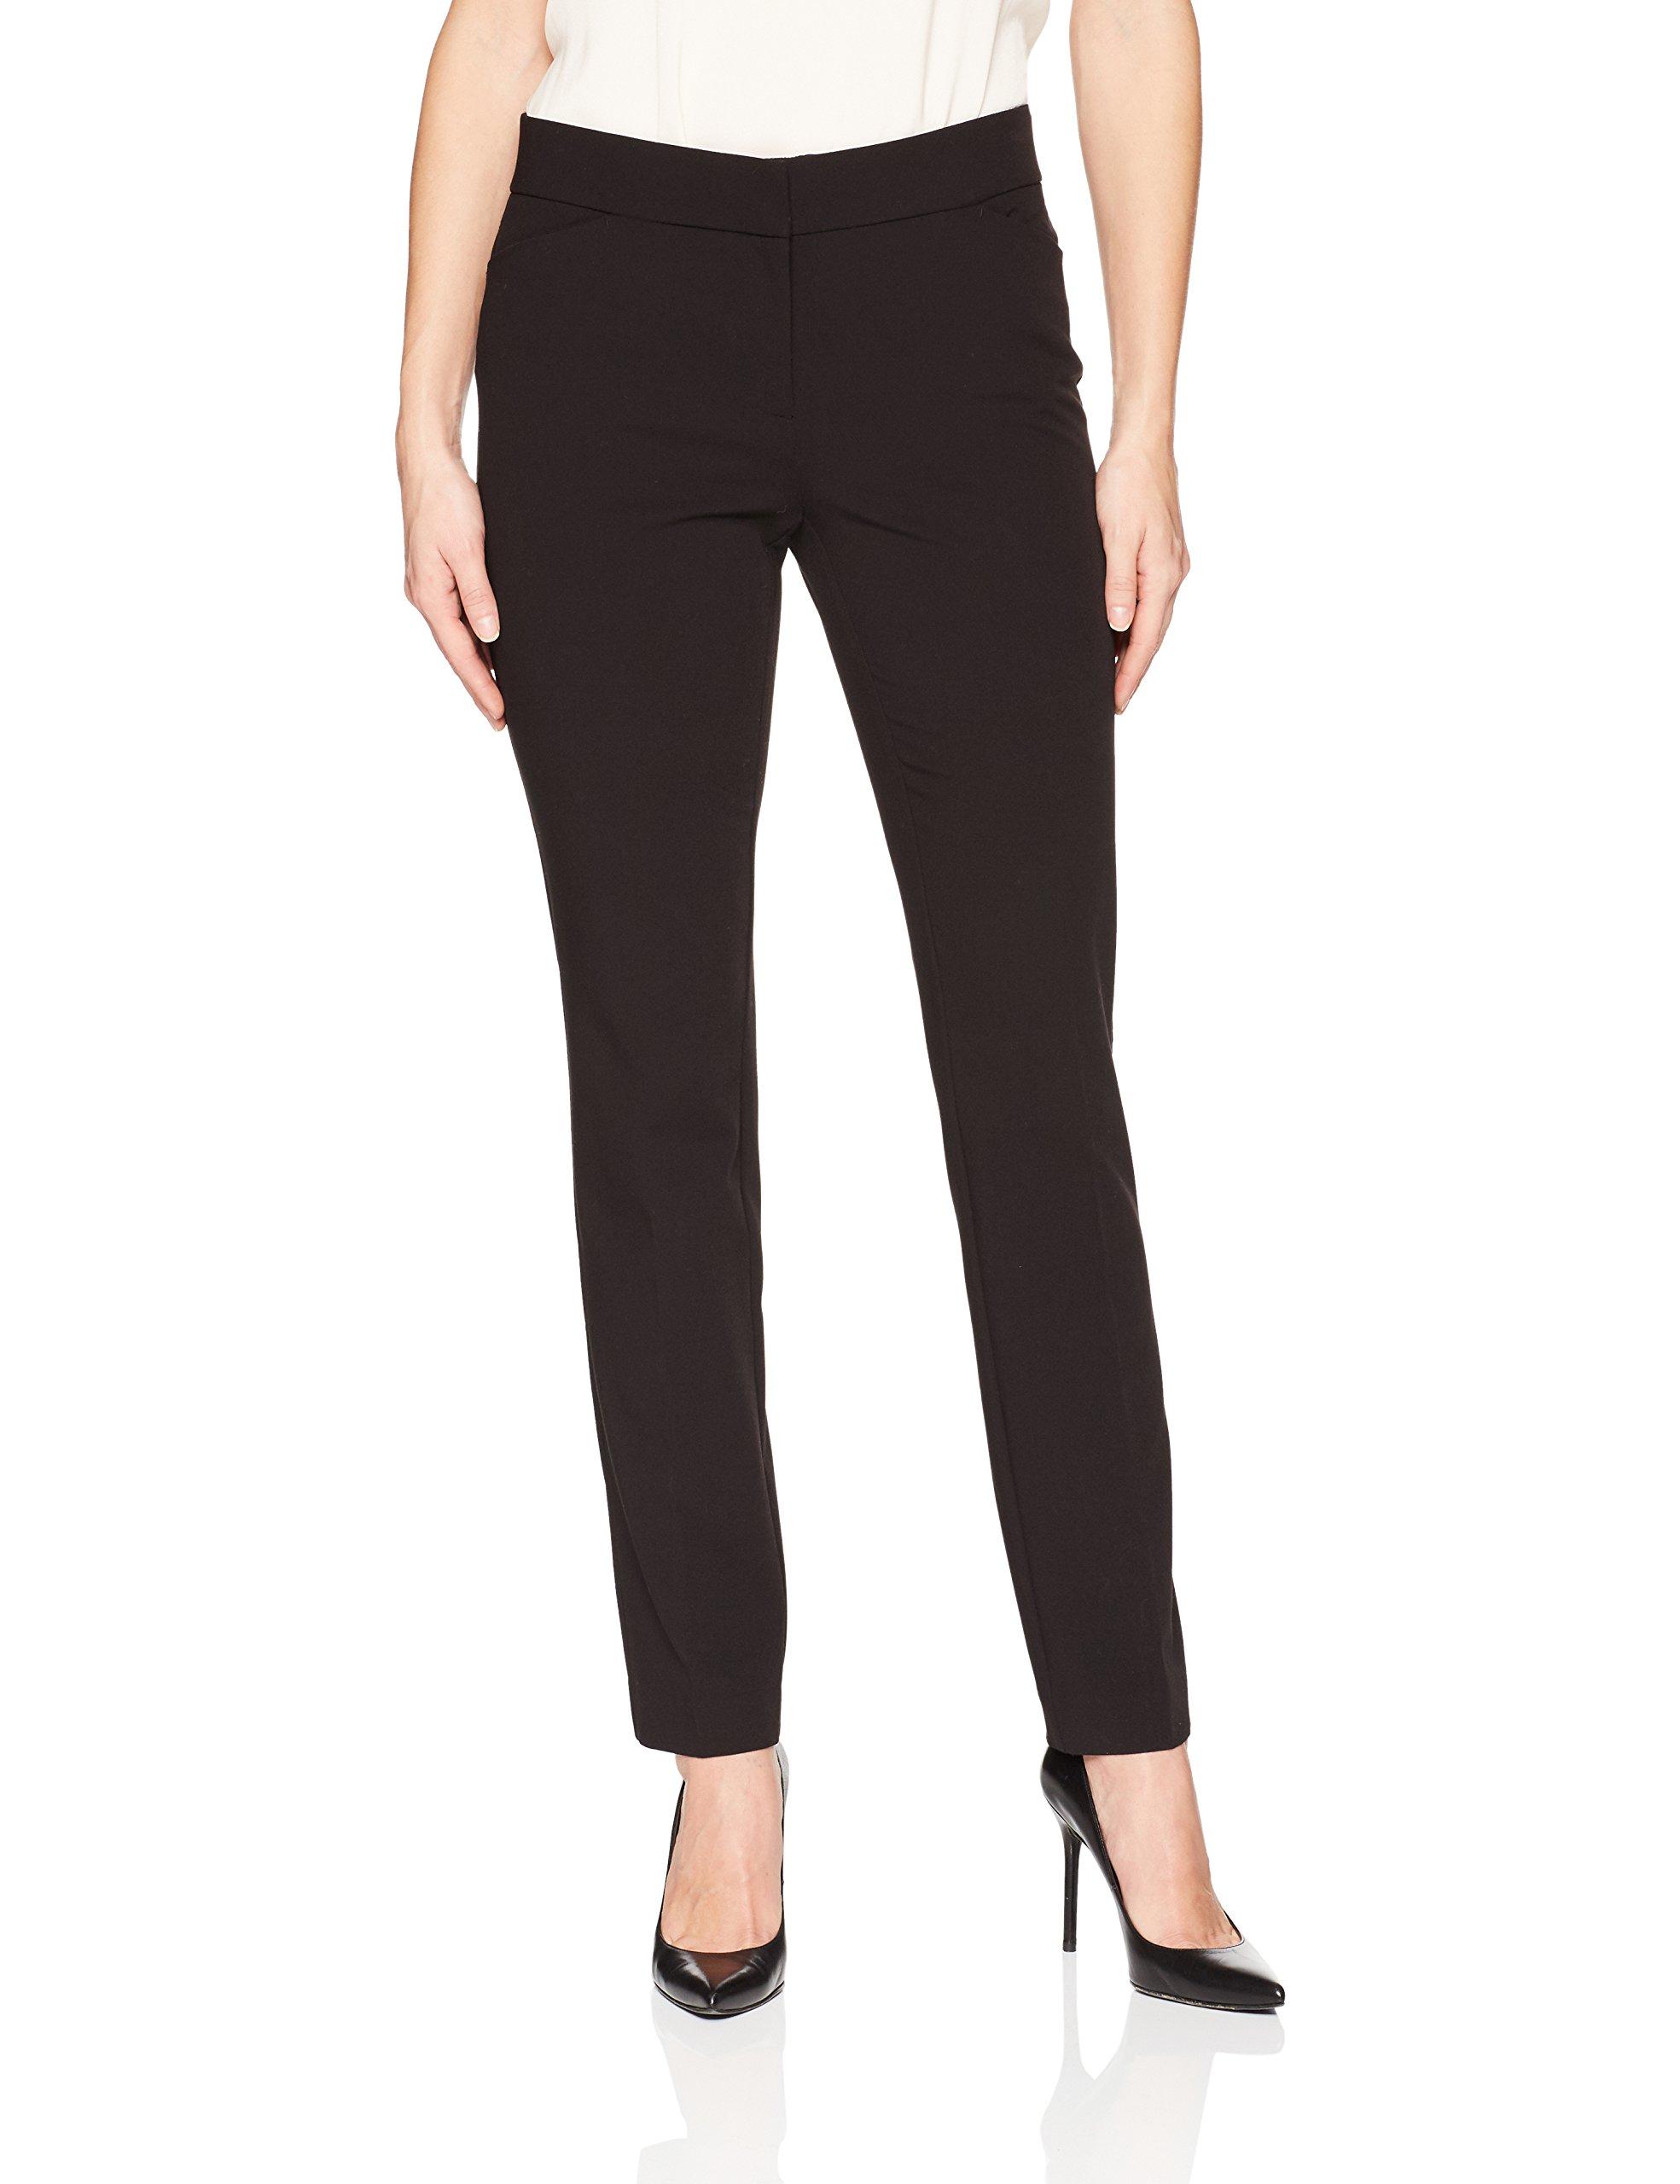 Amazon Brand - Lark & Ro Women's Straight Leg Trouser Pant: Classic Fit, Black, 8L by Lark & Ro